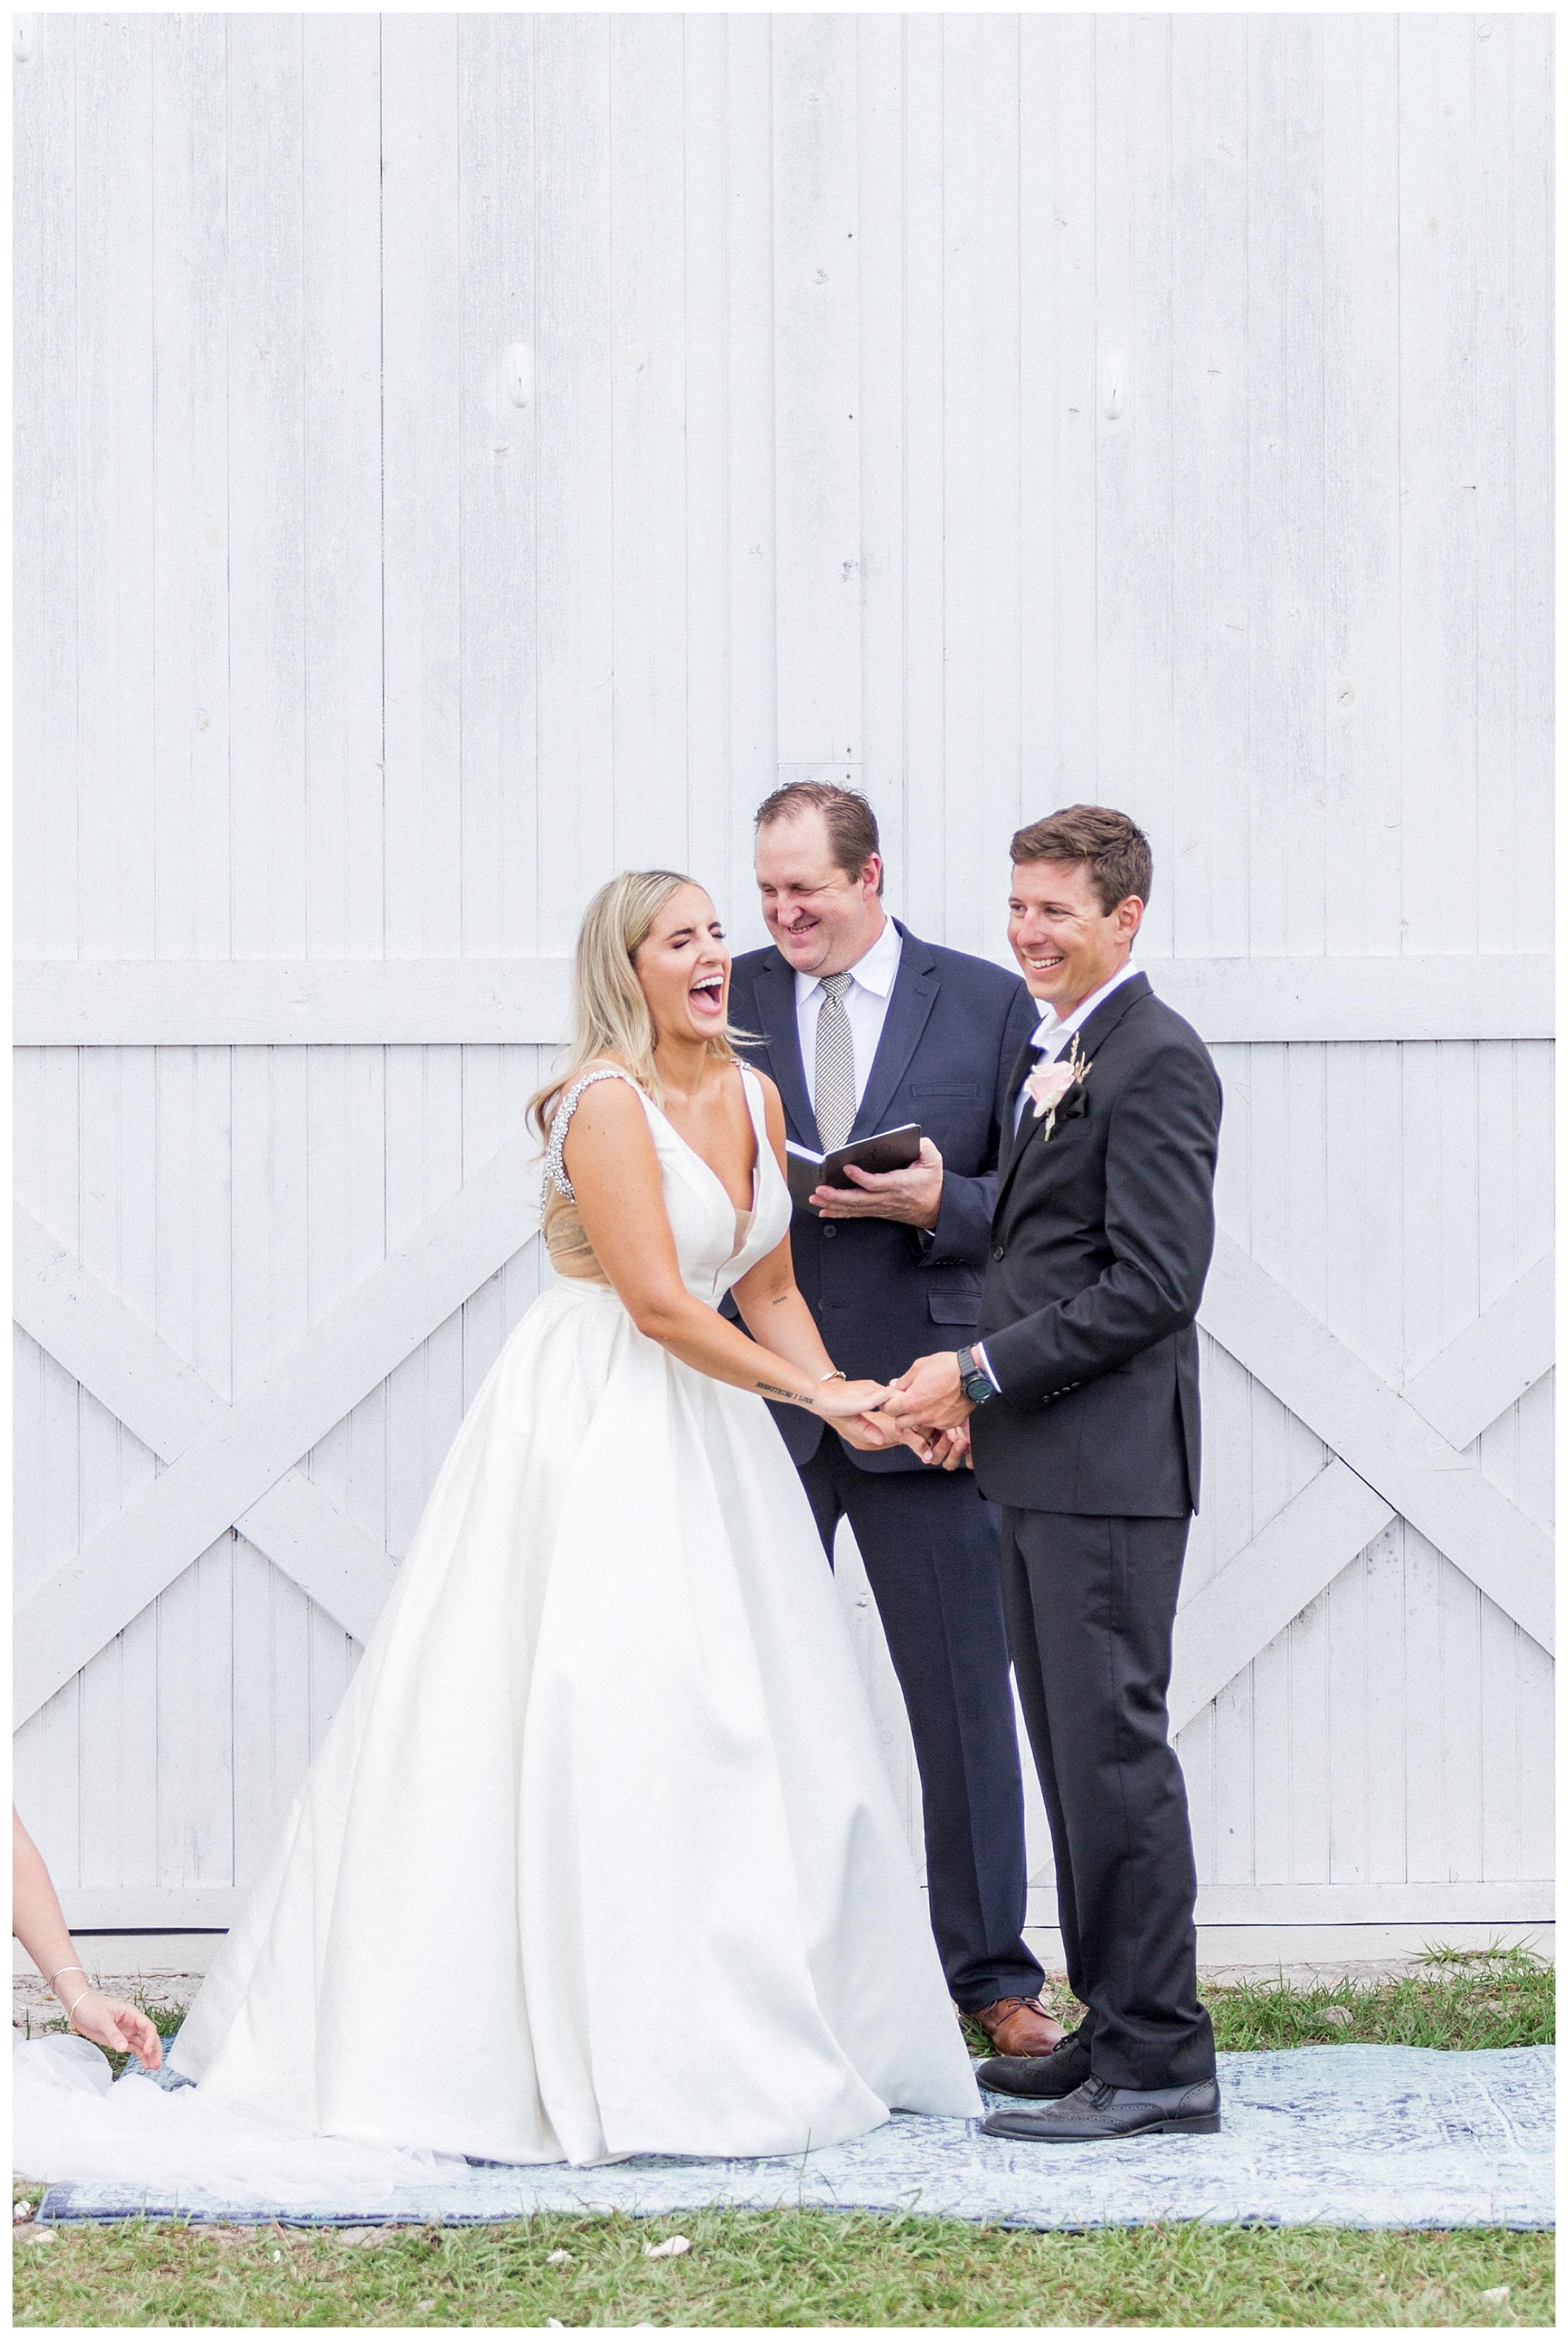 South Florida Wedding Photographer Kir Tuben_0077.jpg